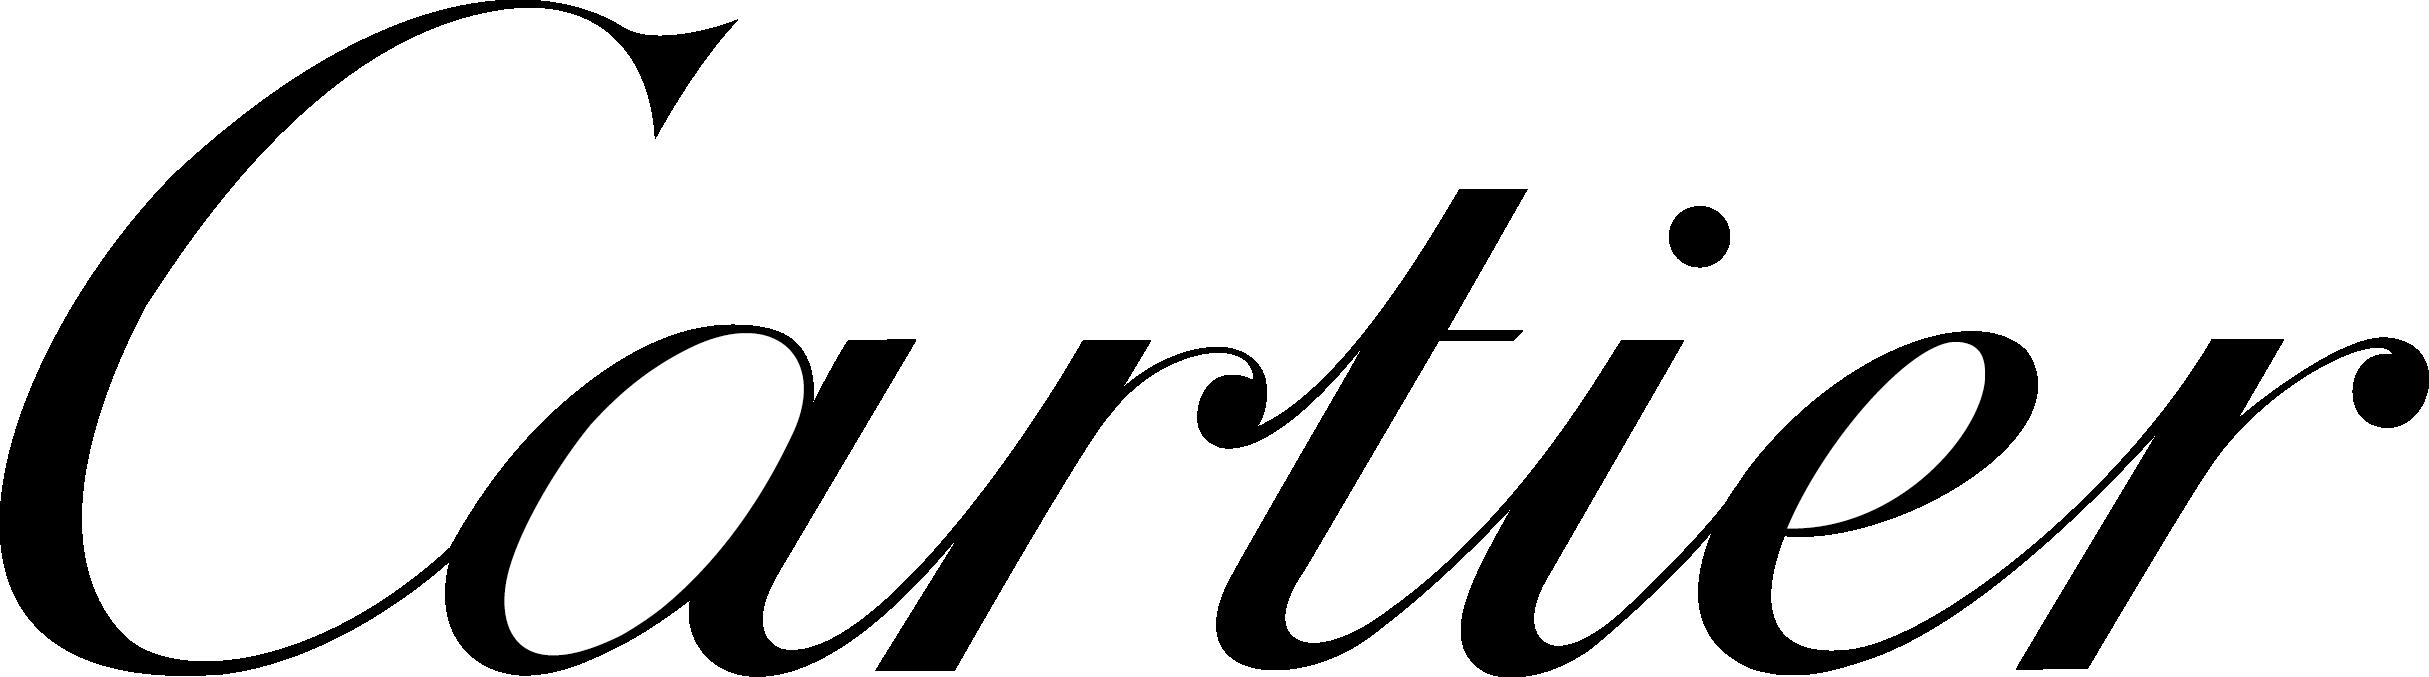 cartier_logo_freelogovectors.net_.png